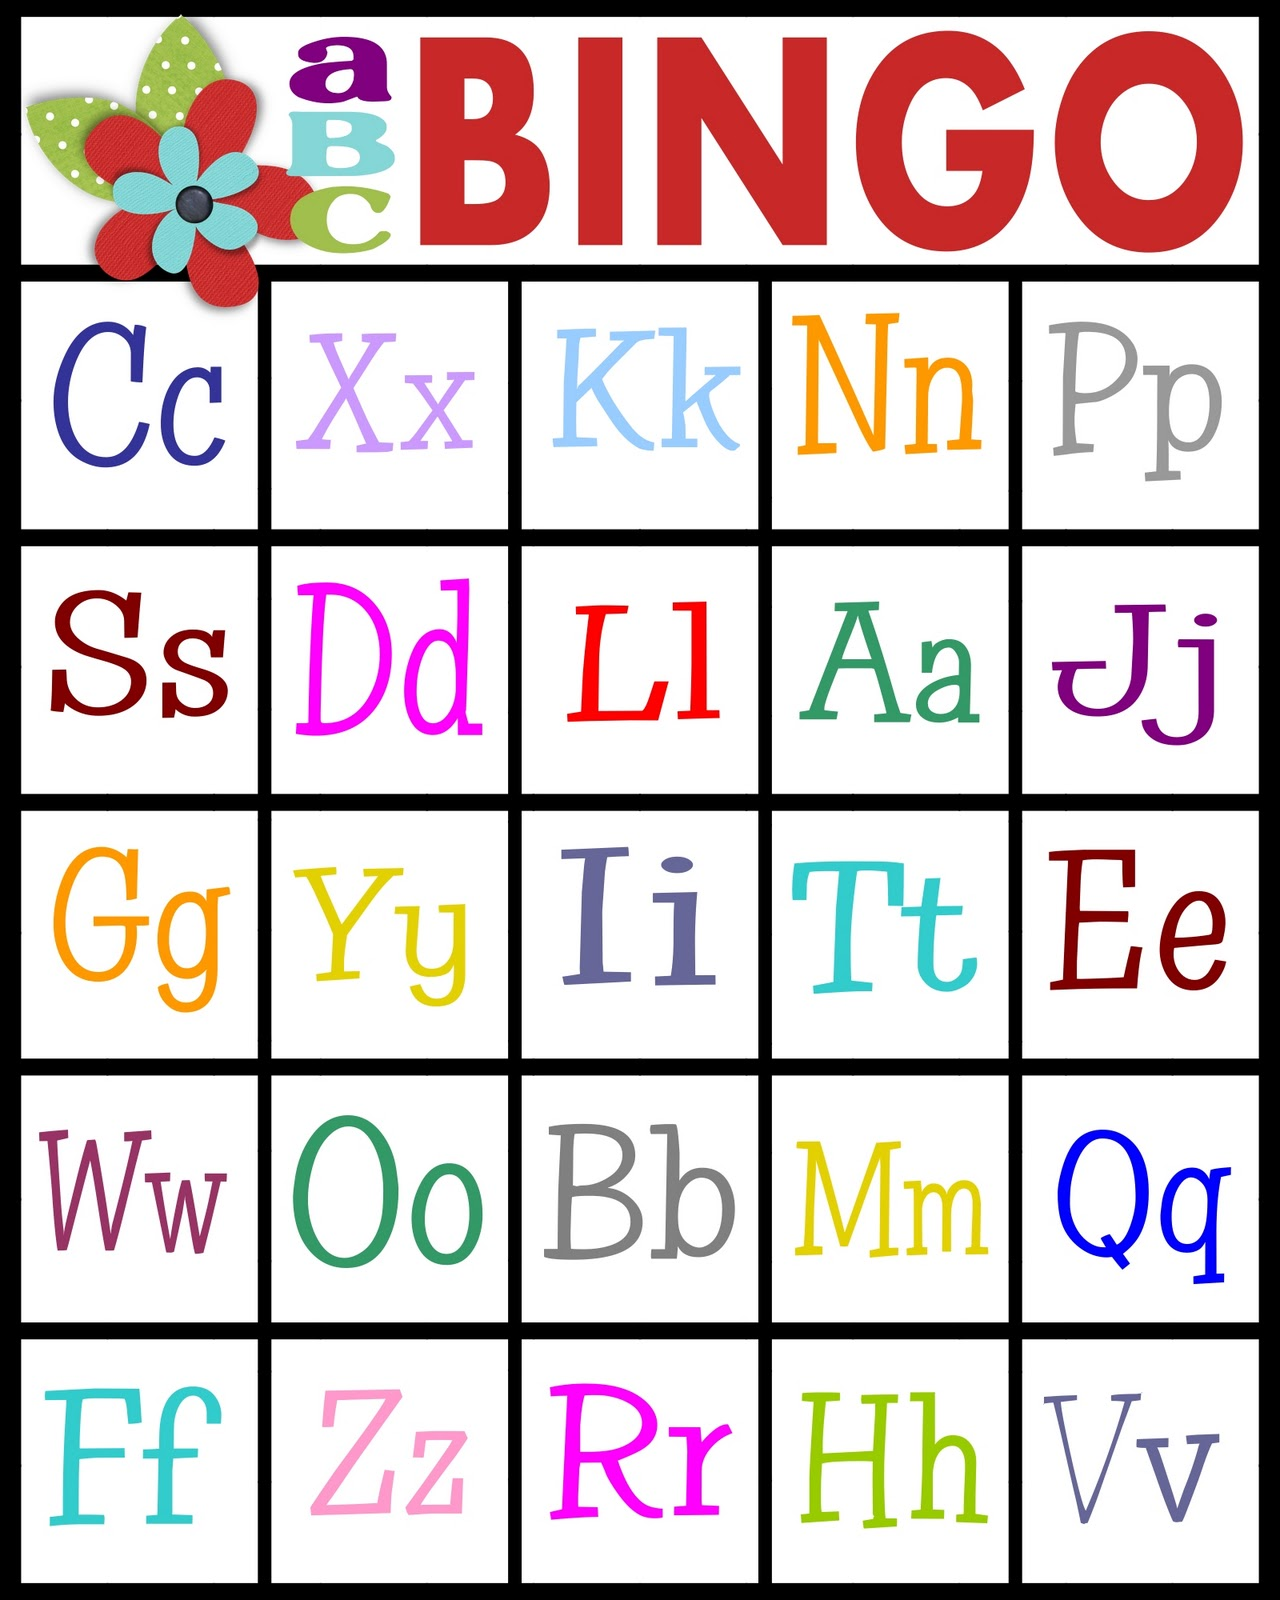 5 Images of ABC Bingo Printable